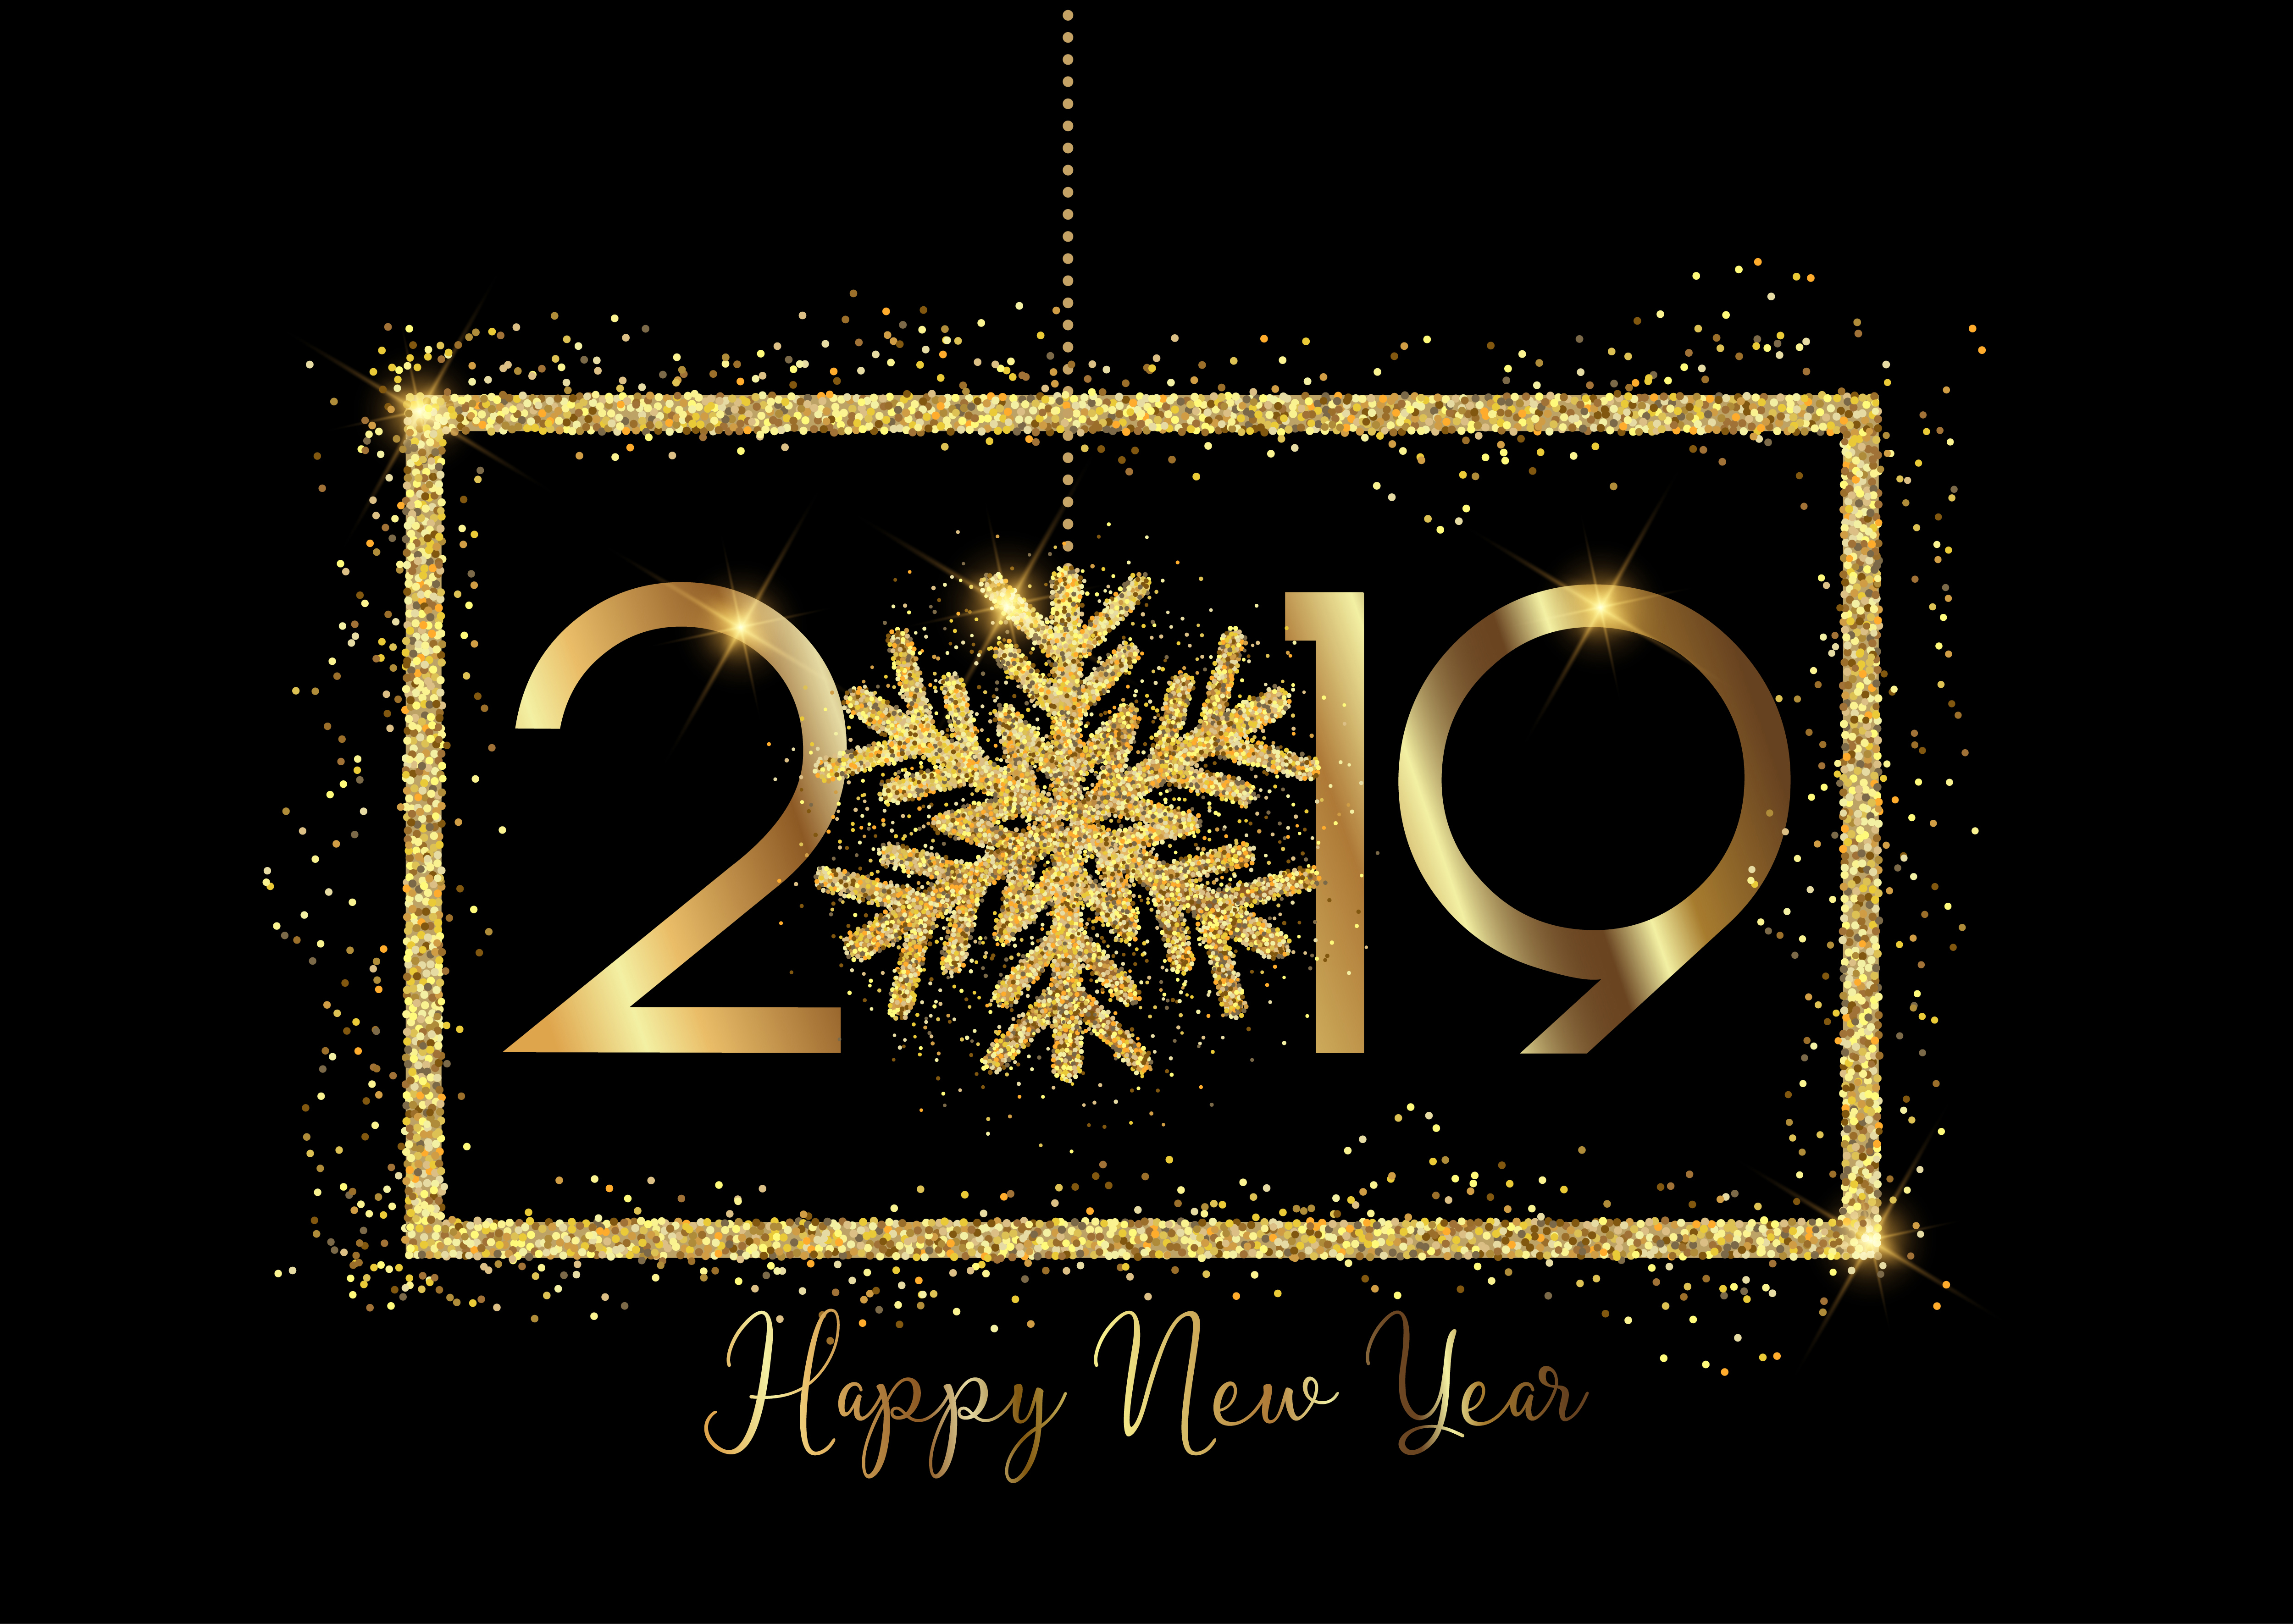 MEILLEURS VOEUX | BONNE ANNEE | HAPPY NEW YEAR